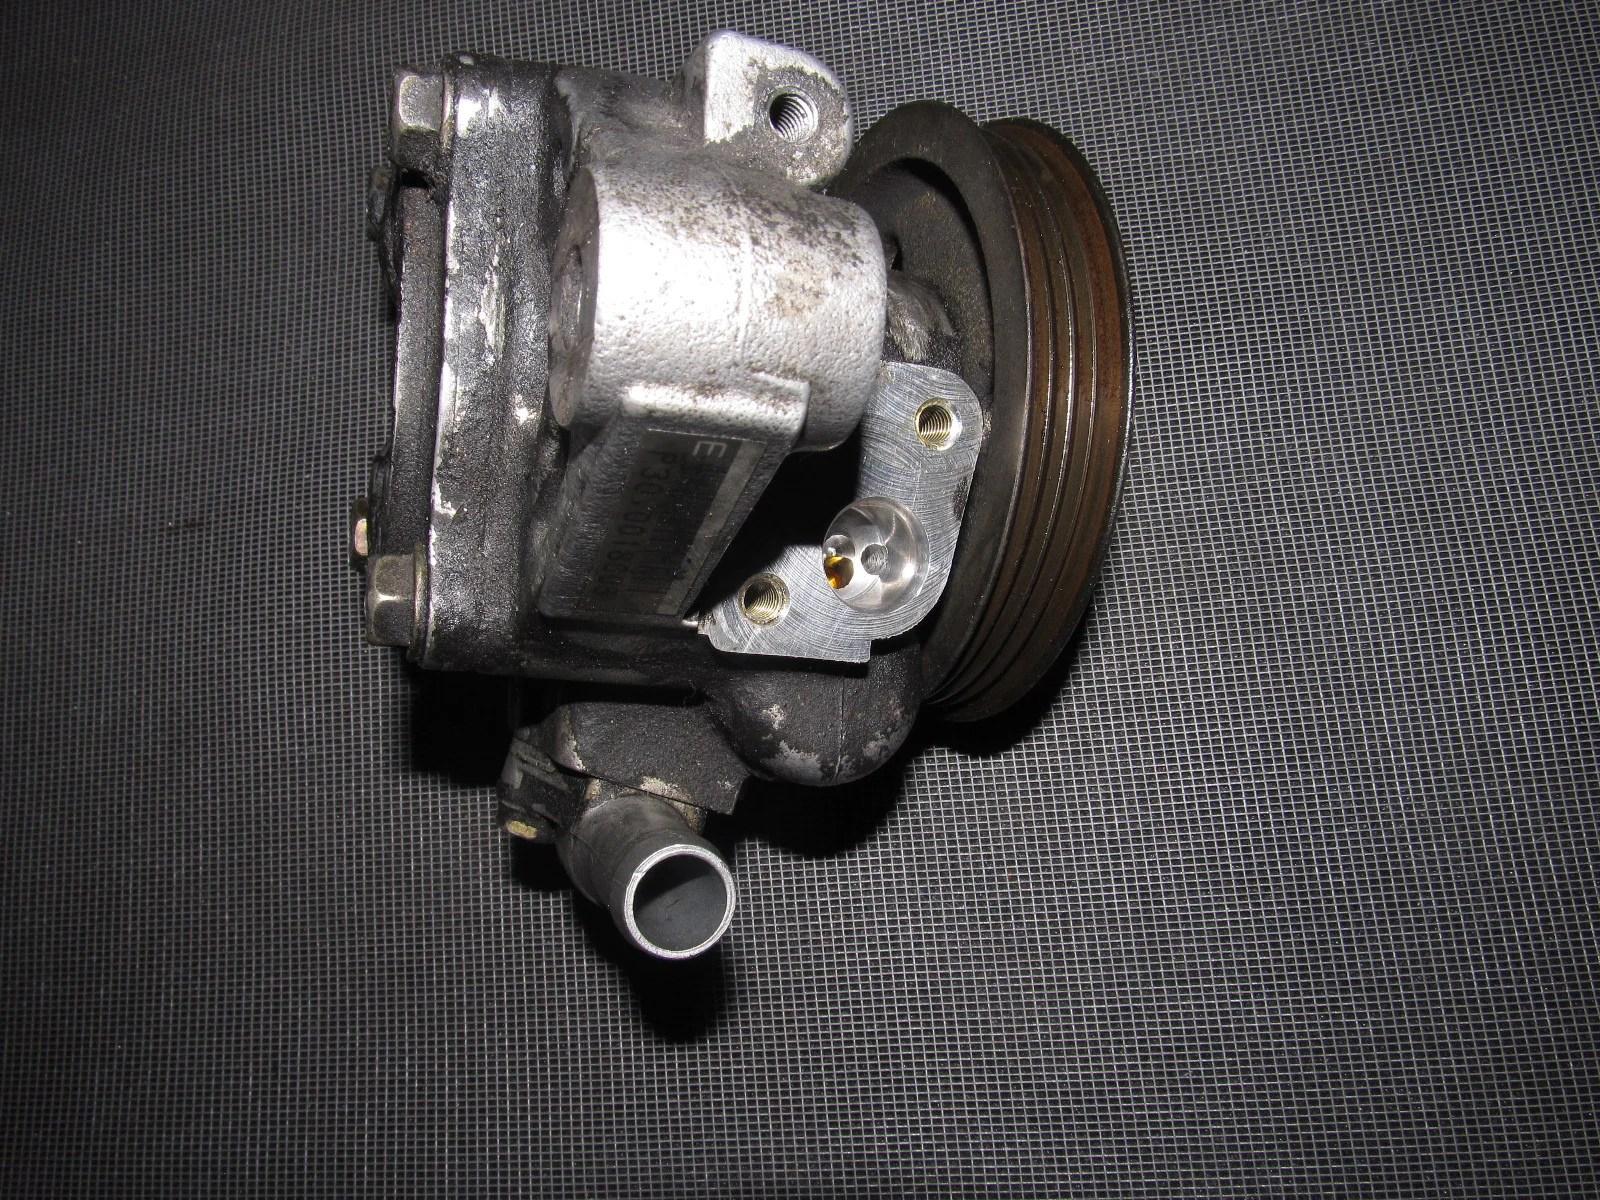 93 94 95 honda del sol b16a oem power steering pump [ 1600 x 1200 Pixel ]